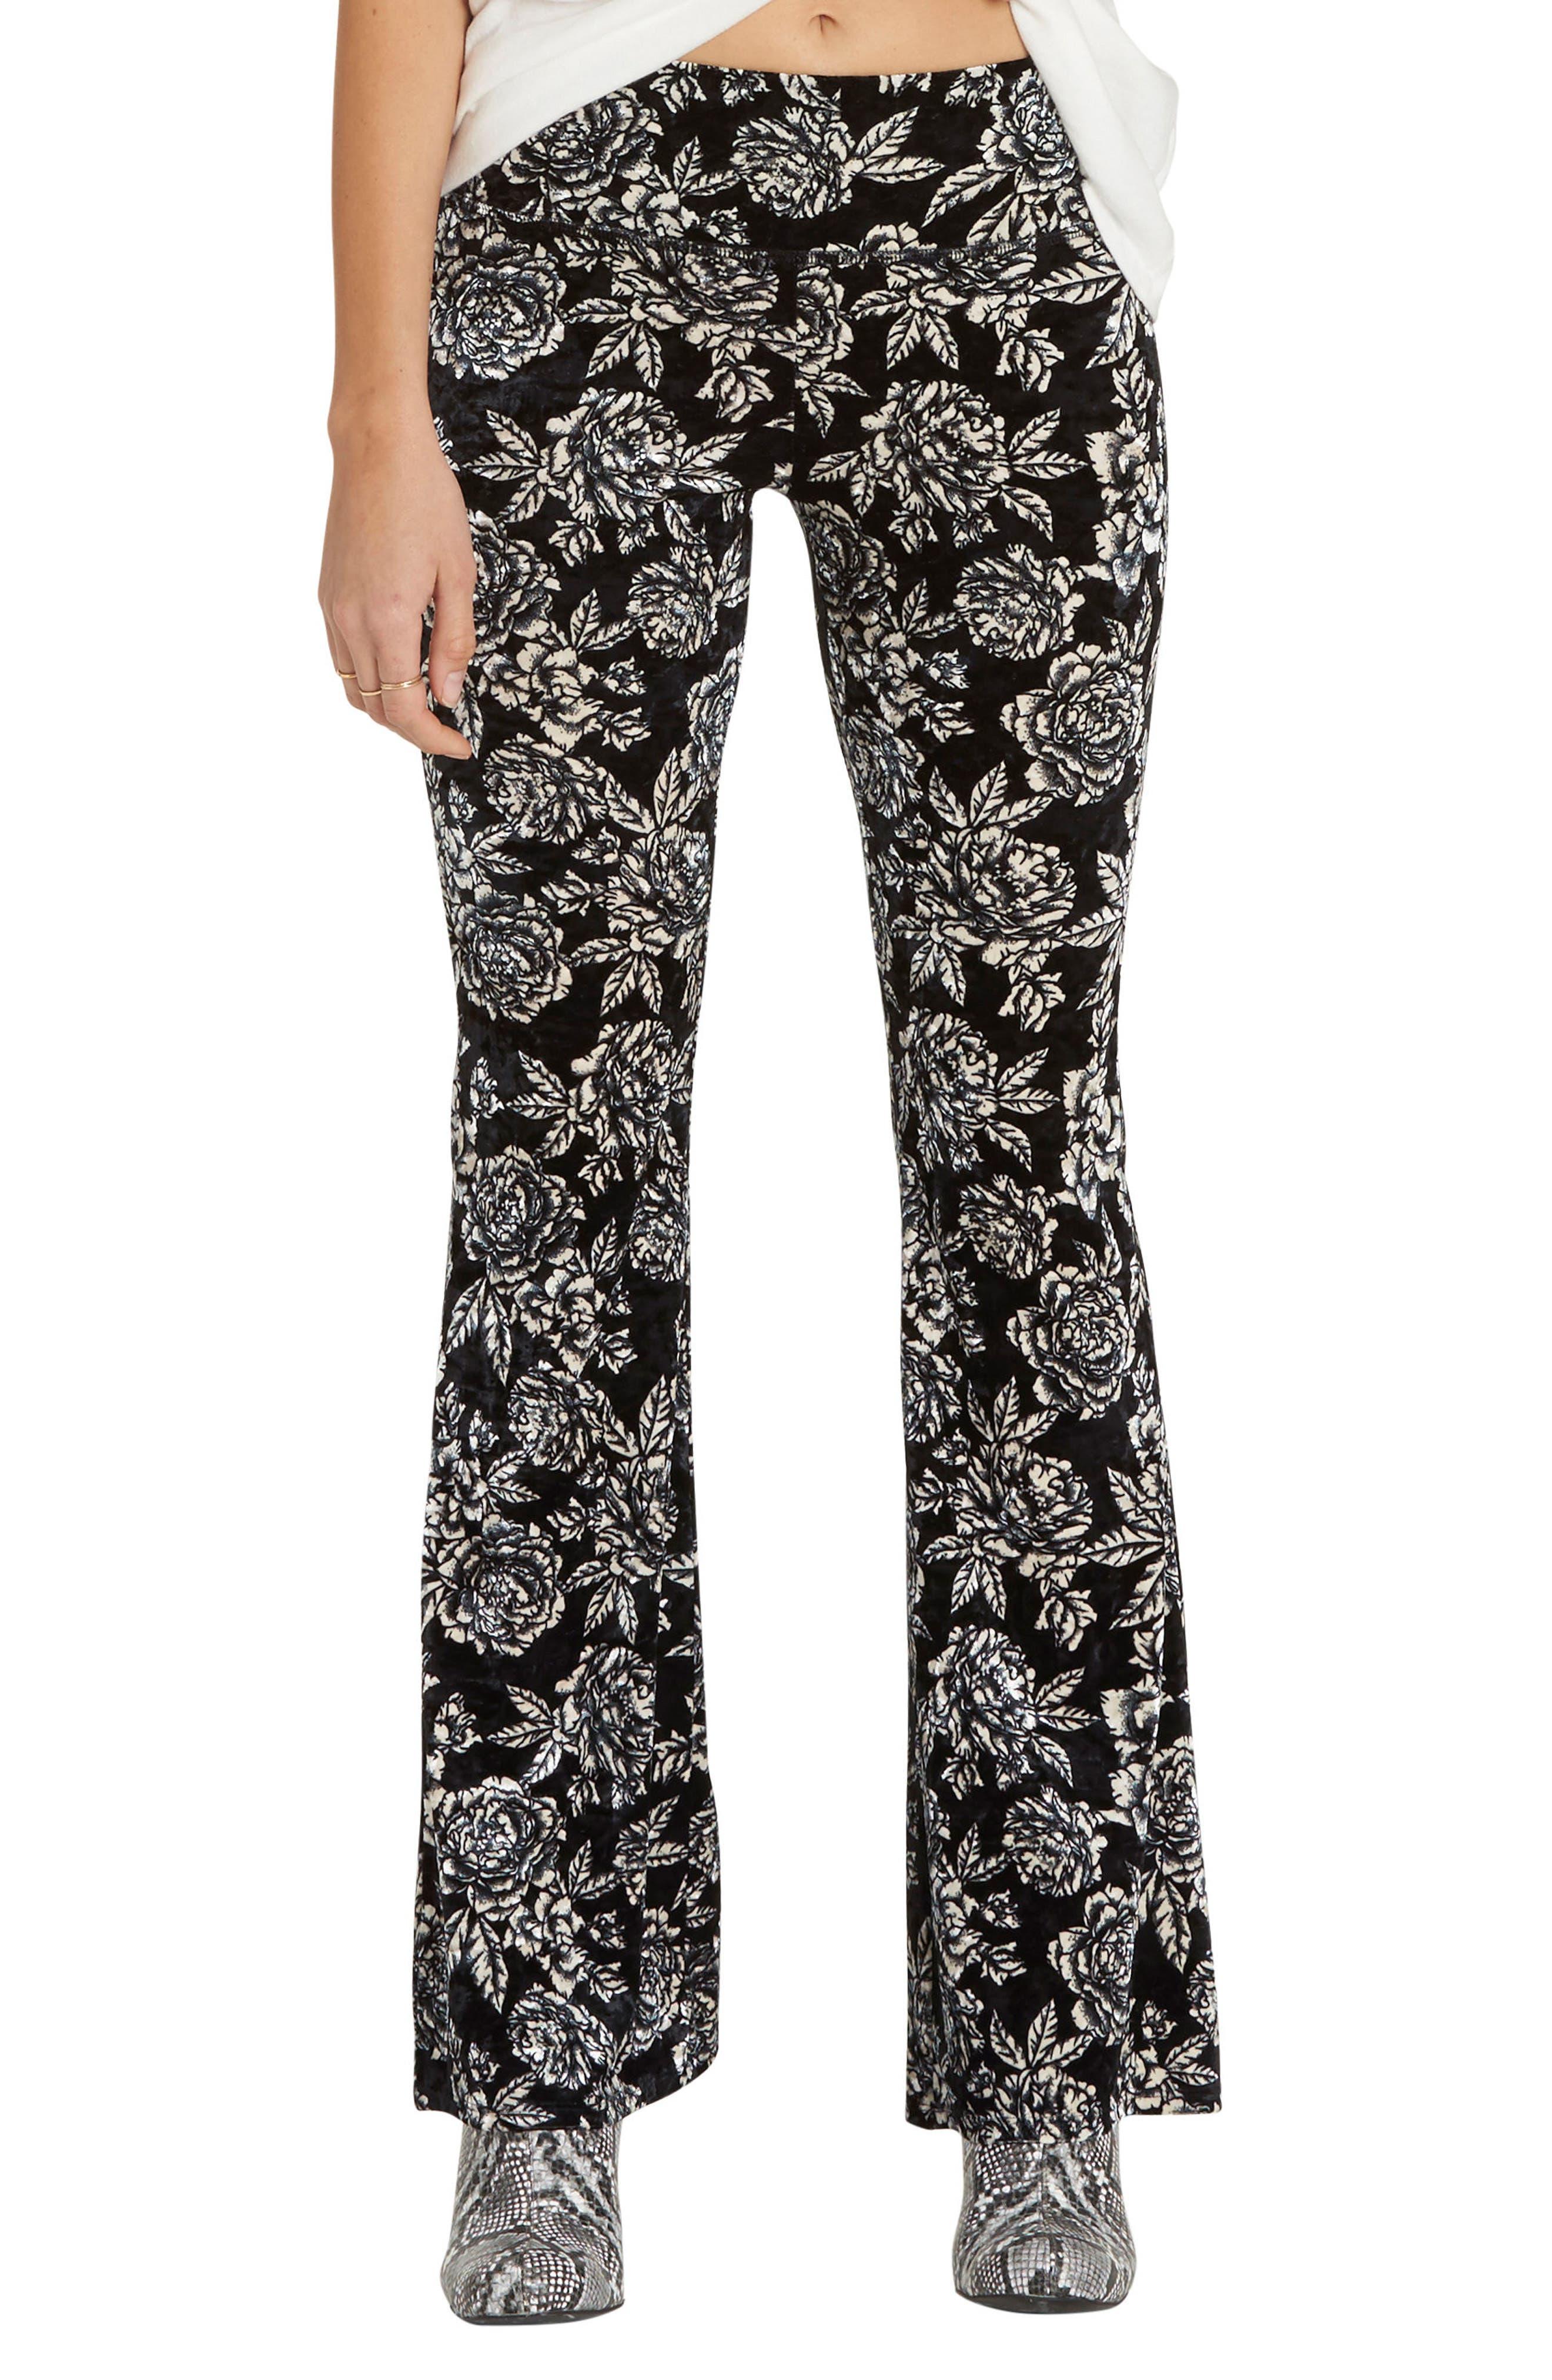 Billabong Turn Me Round Floral Print Velvet Flare Pants